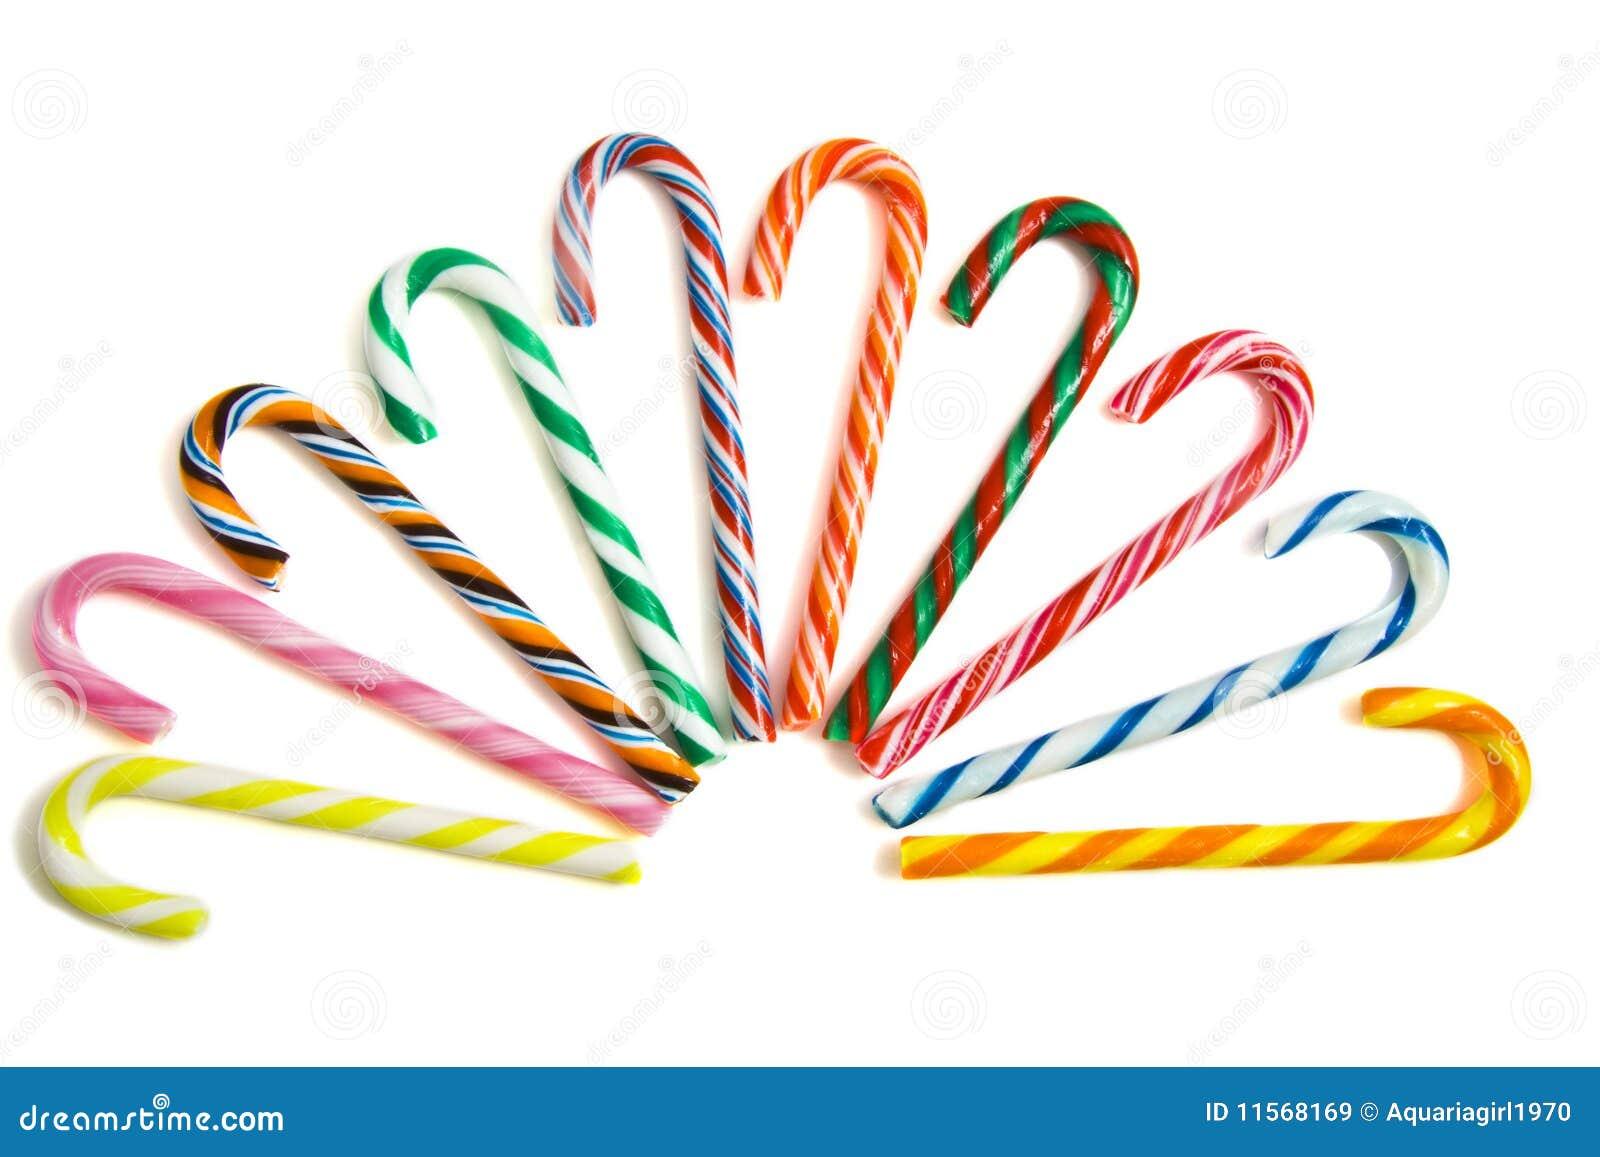 Caramelo-bastones dulces imagen de archivo. Imagen de colores ...